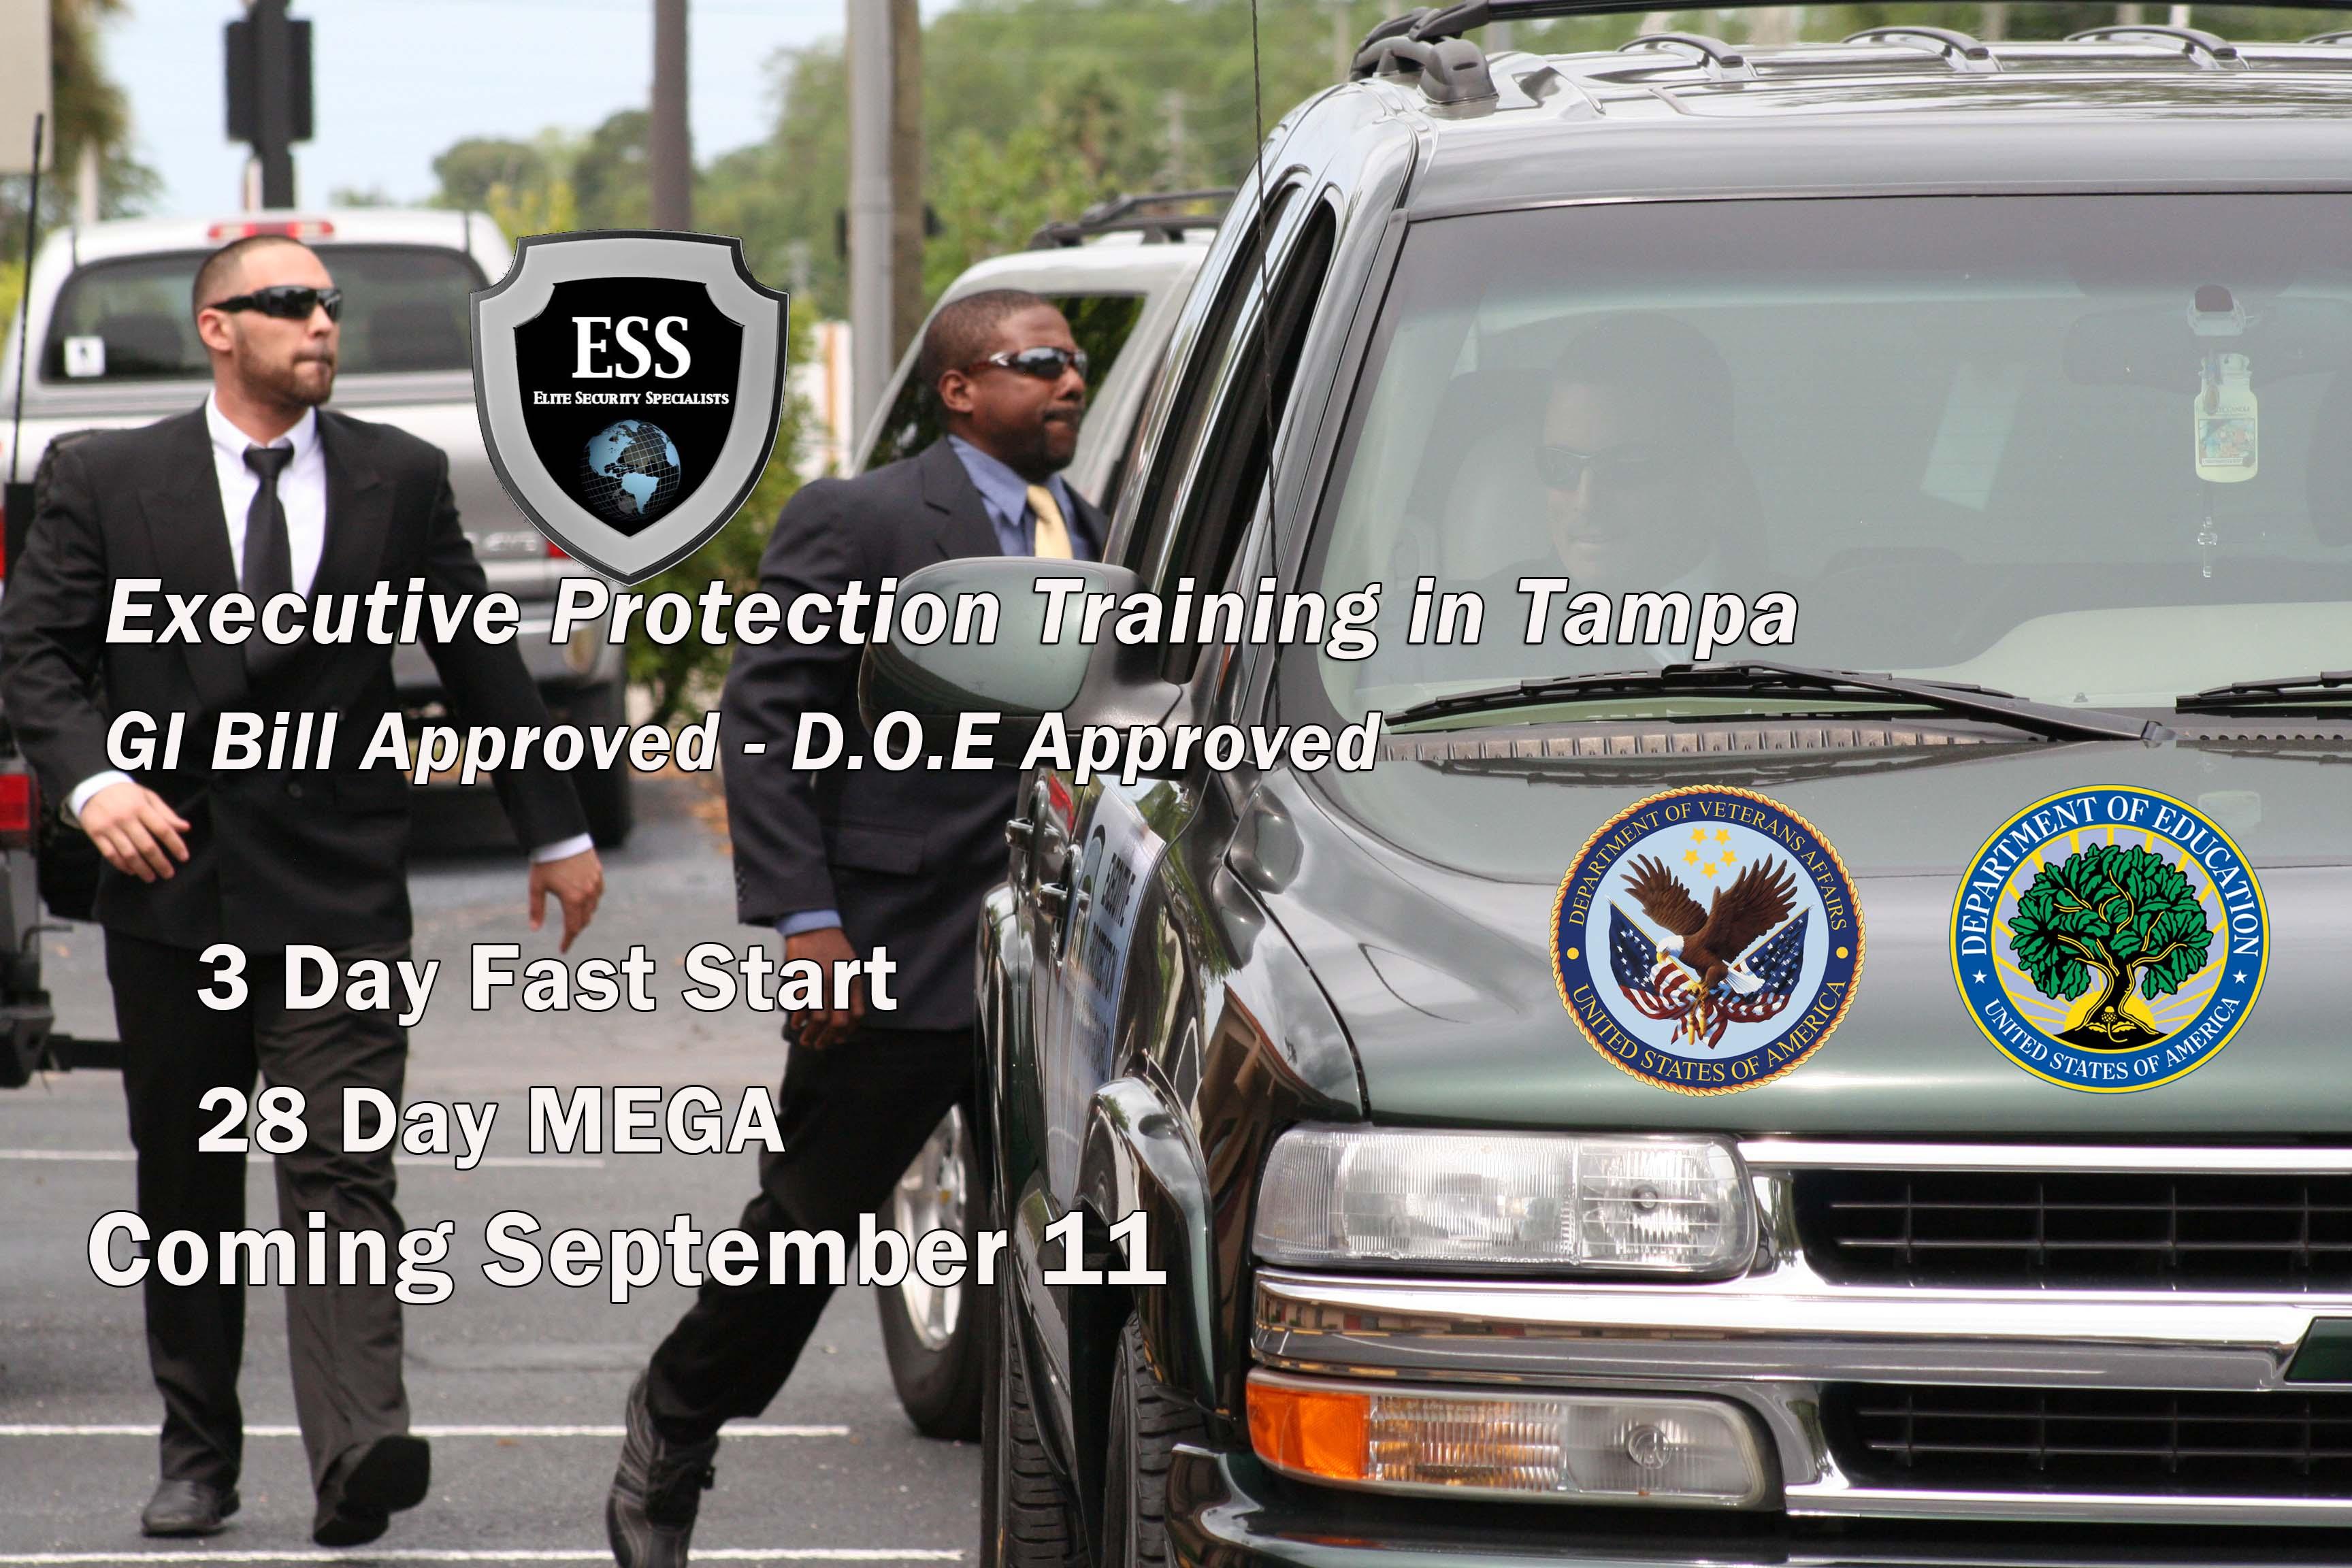 Executive Protection Courses in Florida - September 11